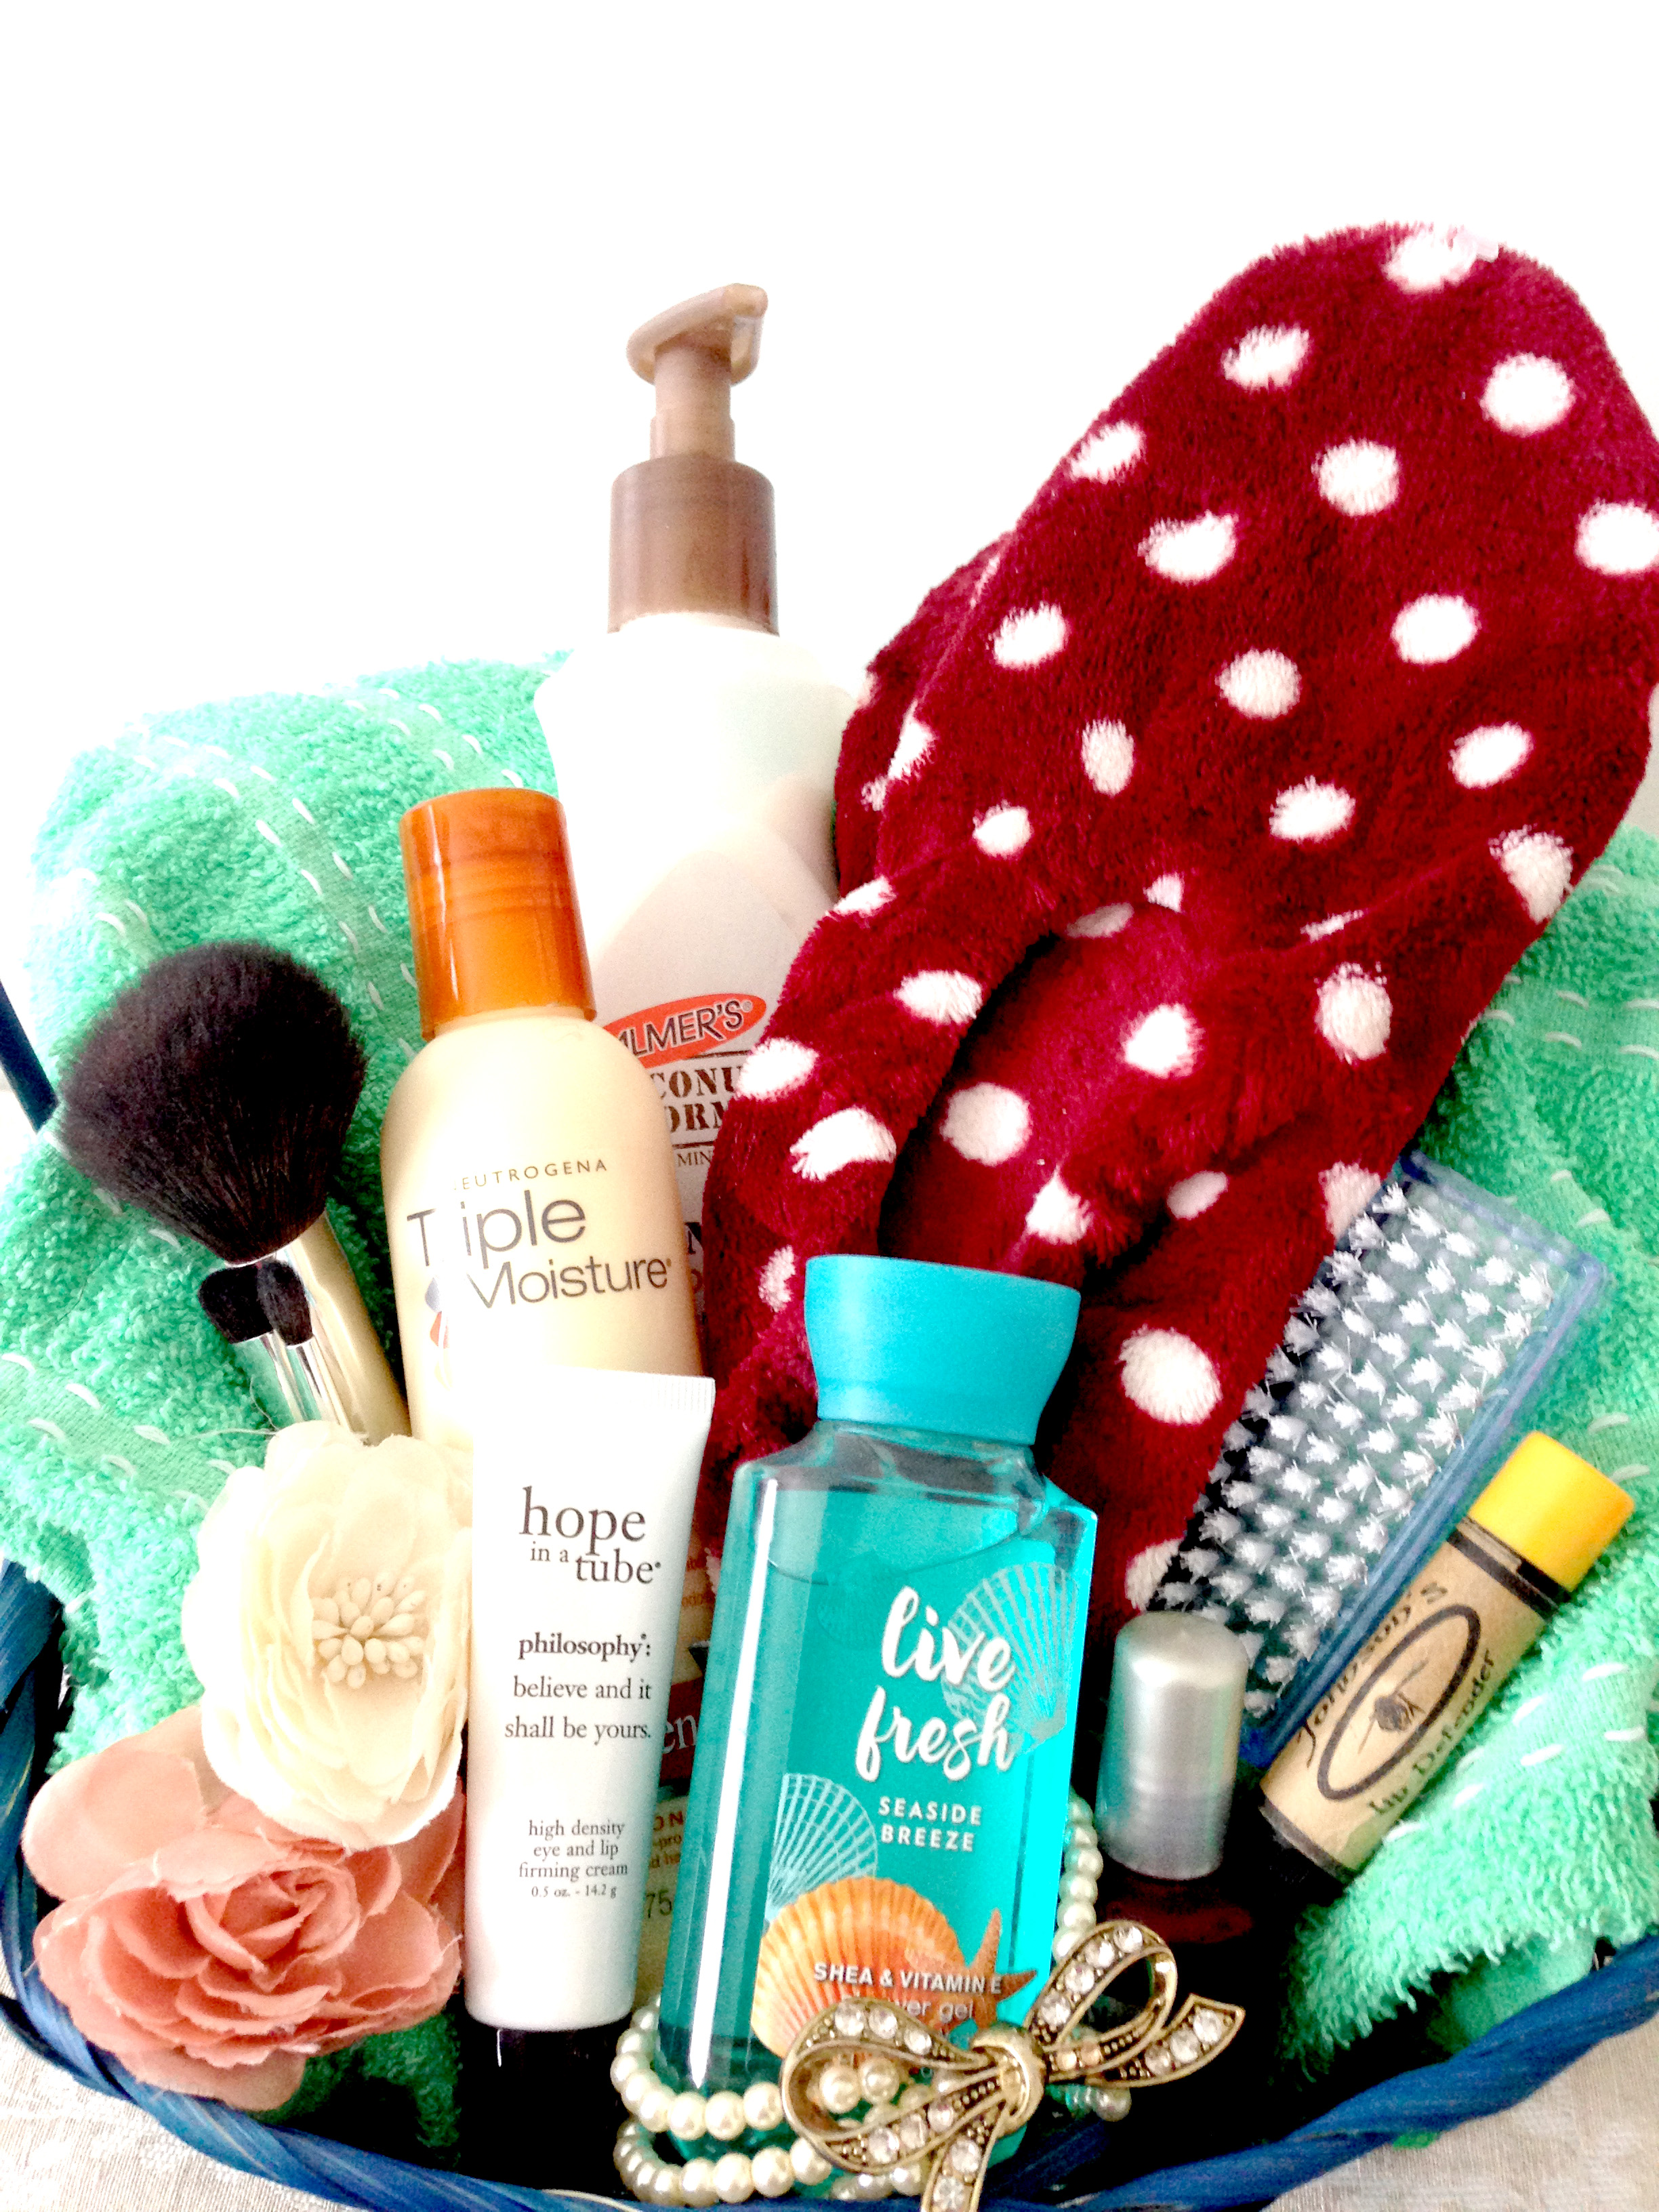 200+ Gift Basket Ideas that aren't junk